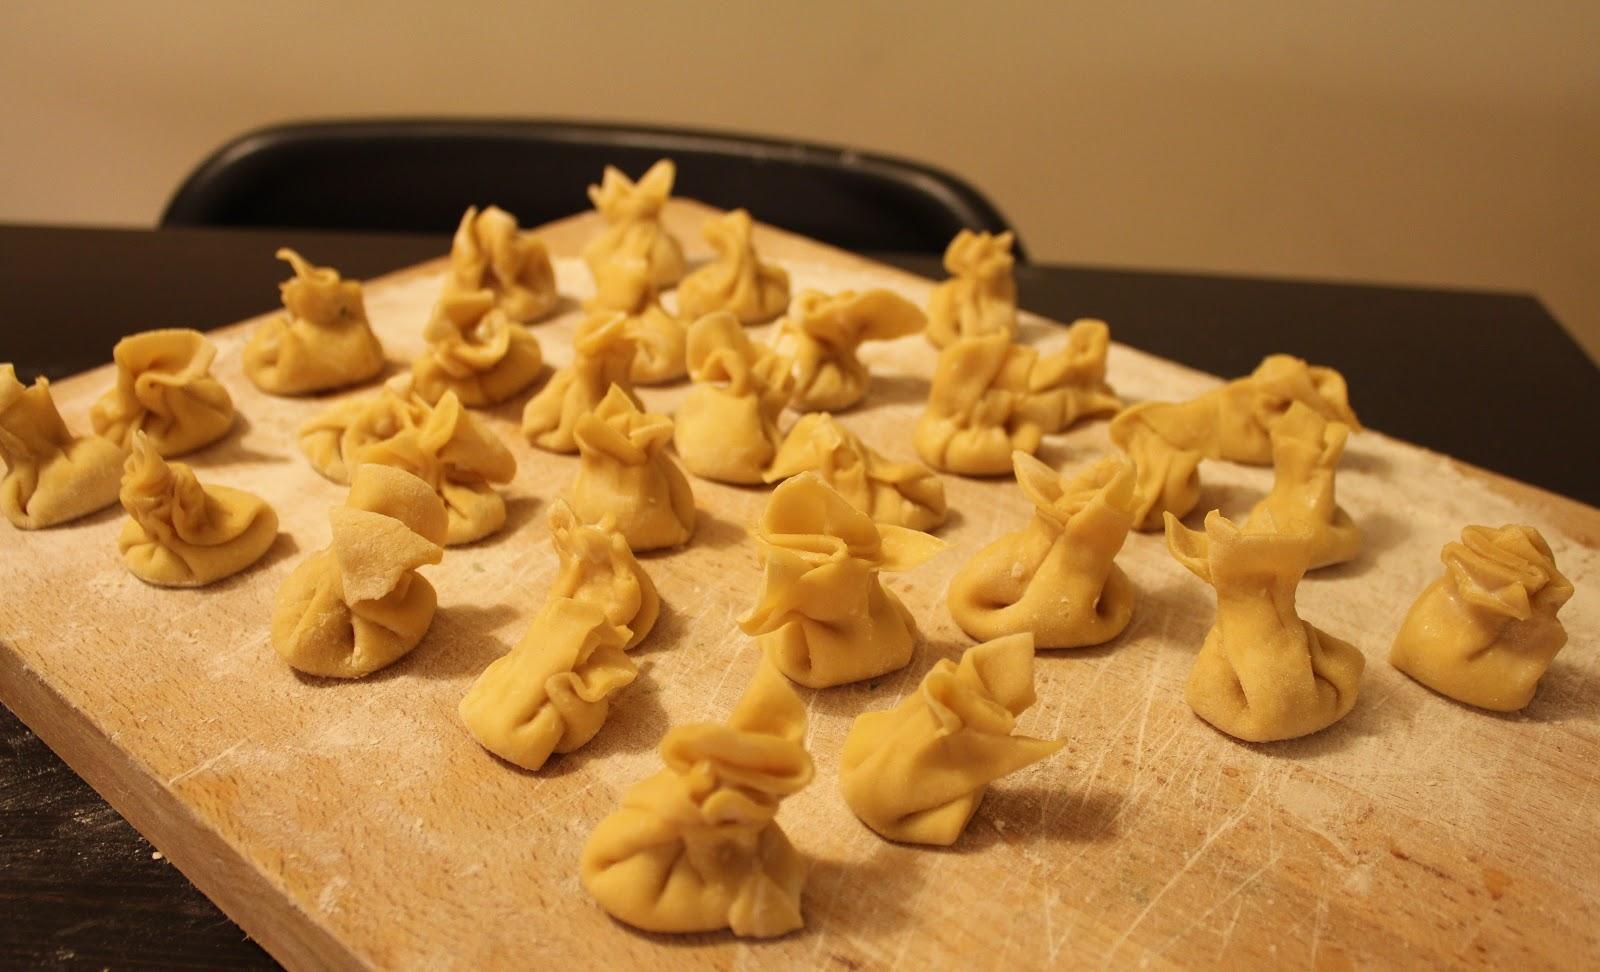 The Savory Lab Fagottini Di Formaggio Cheese Bundles